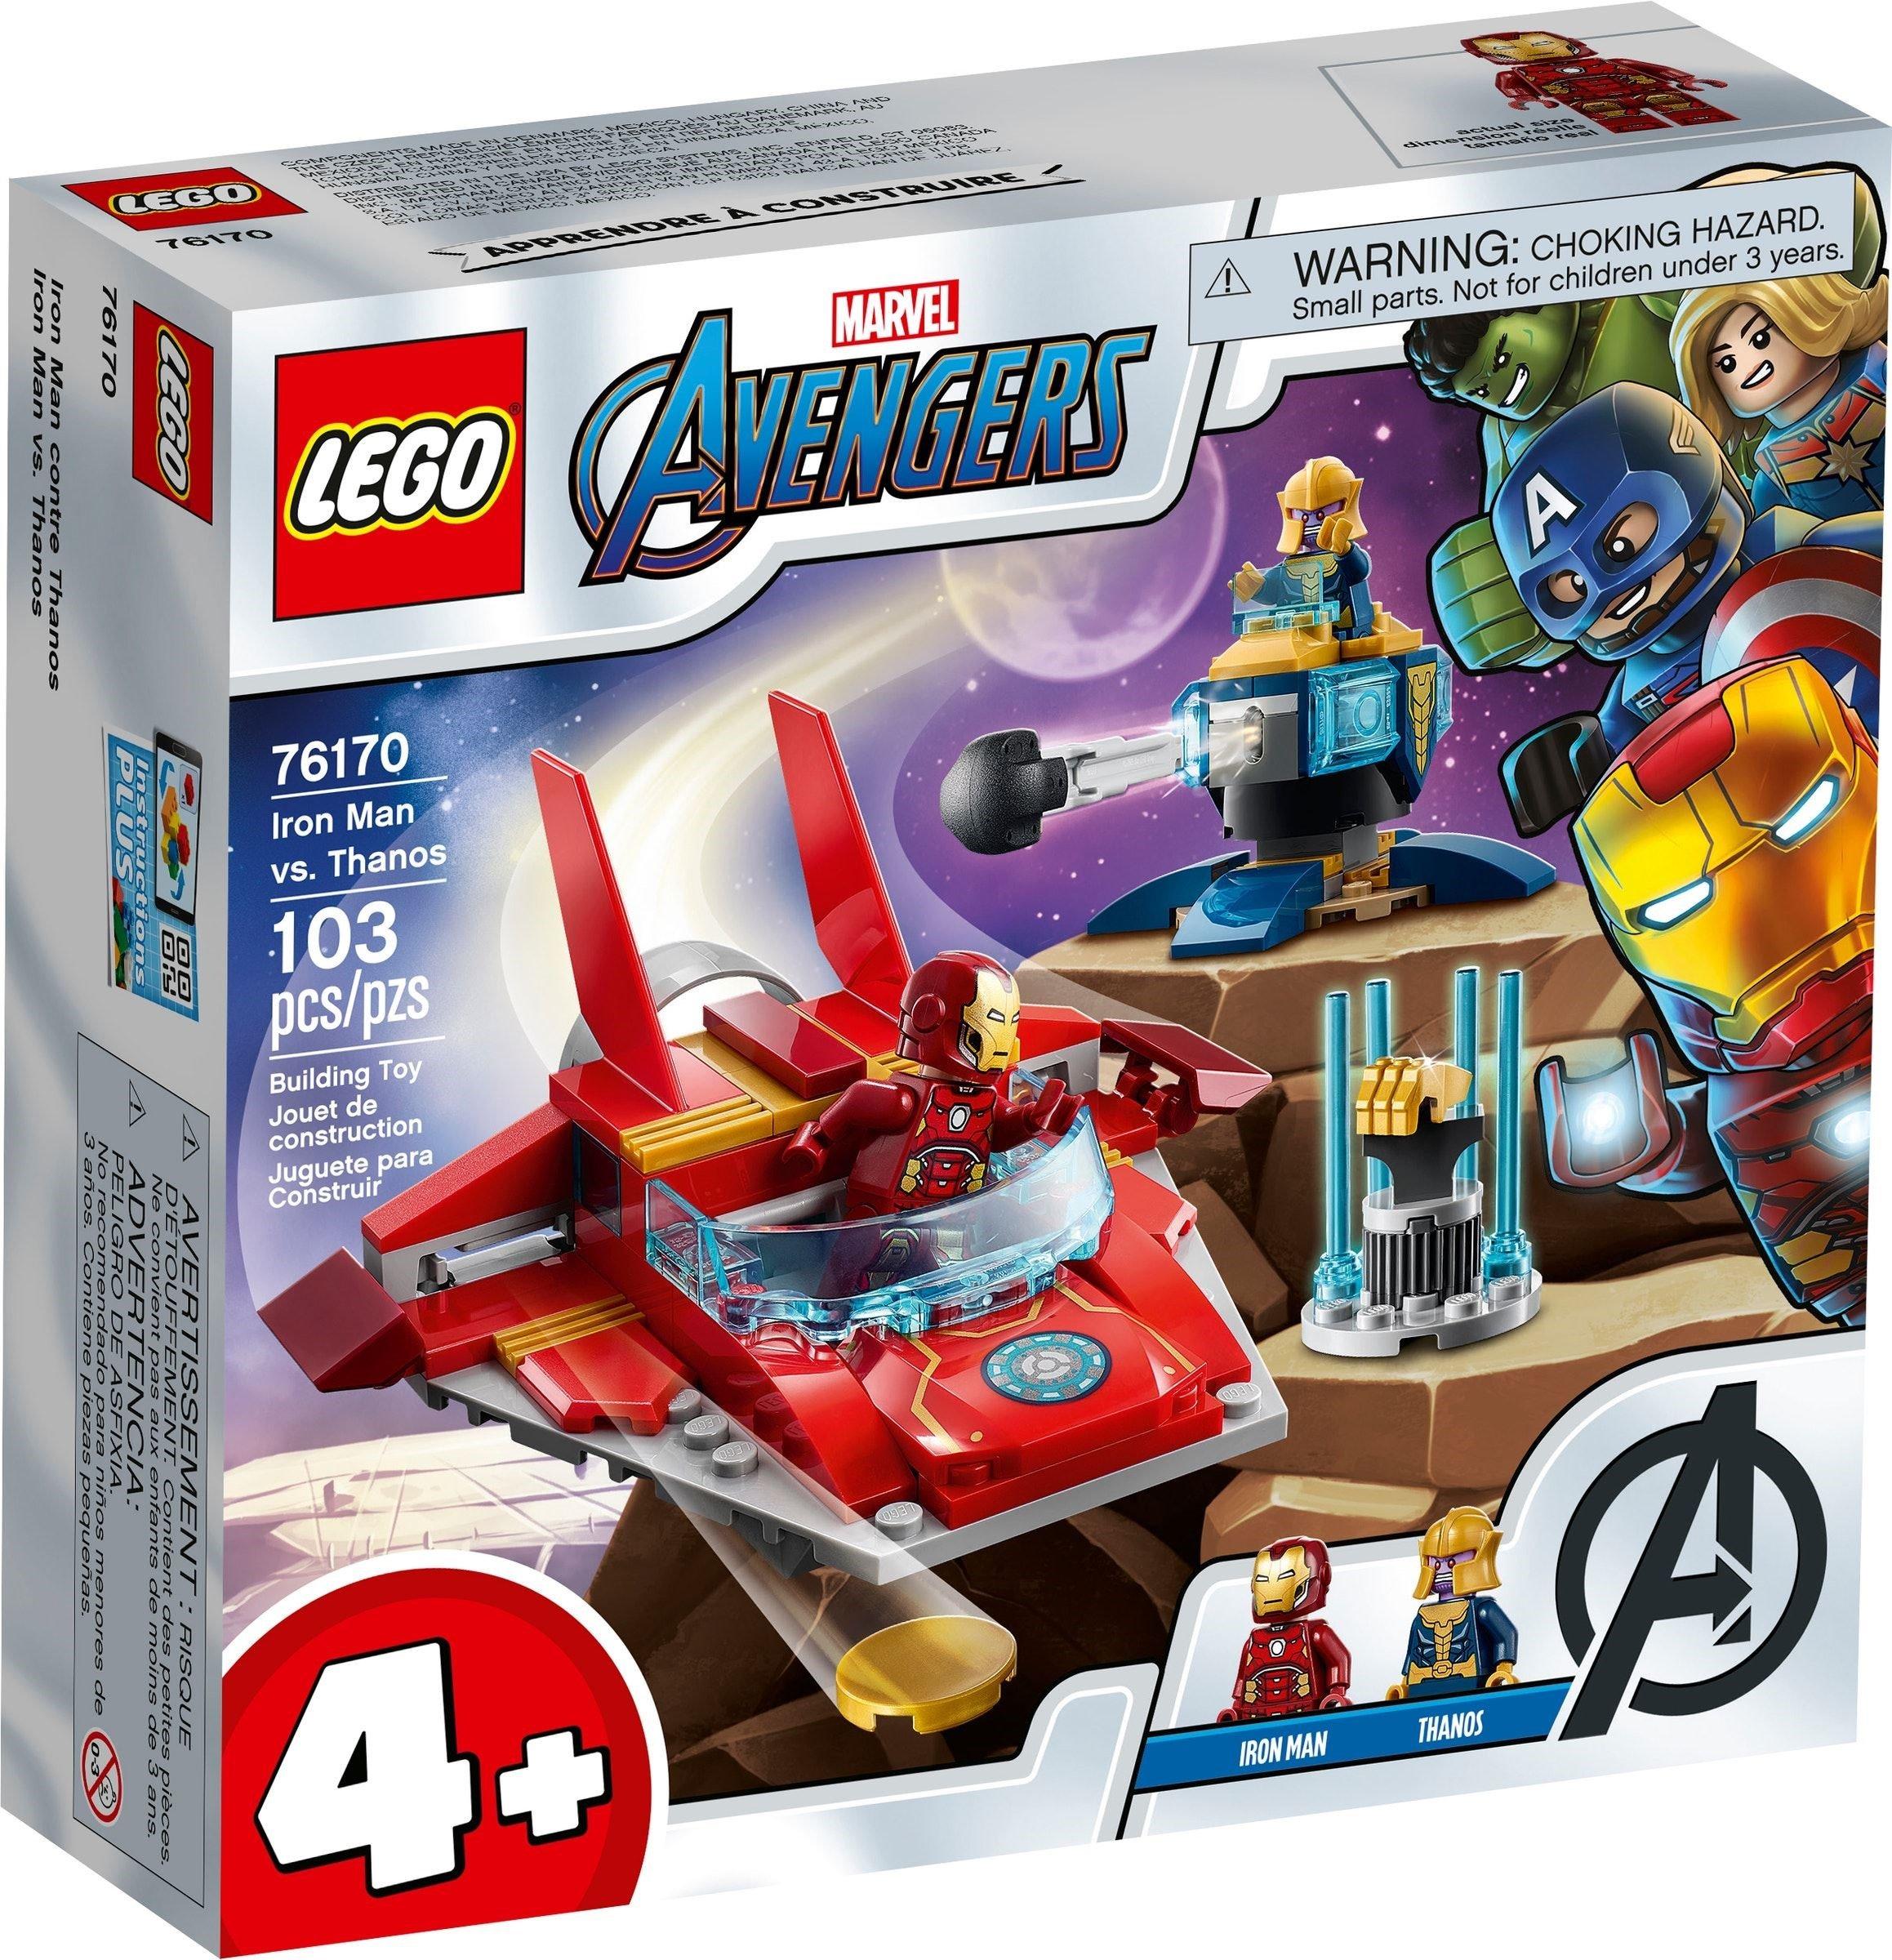 LEGO Super Heroes - Iron Man vs. Thanos (76170)